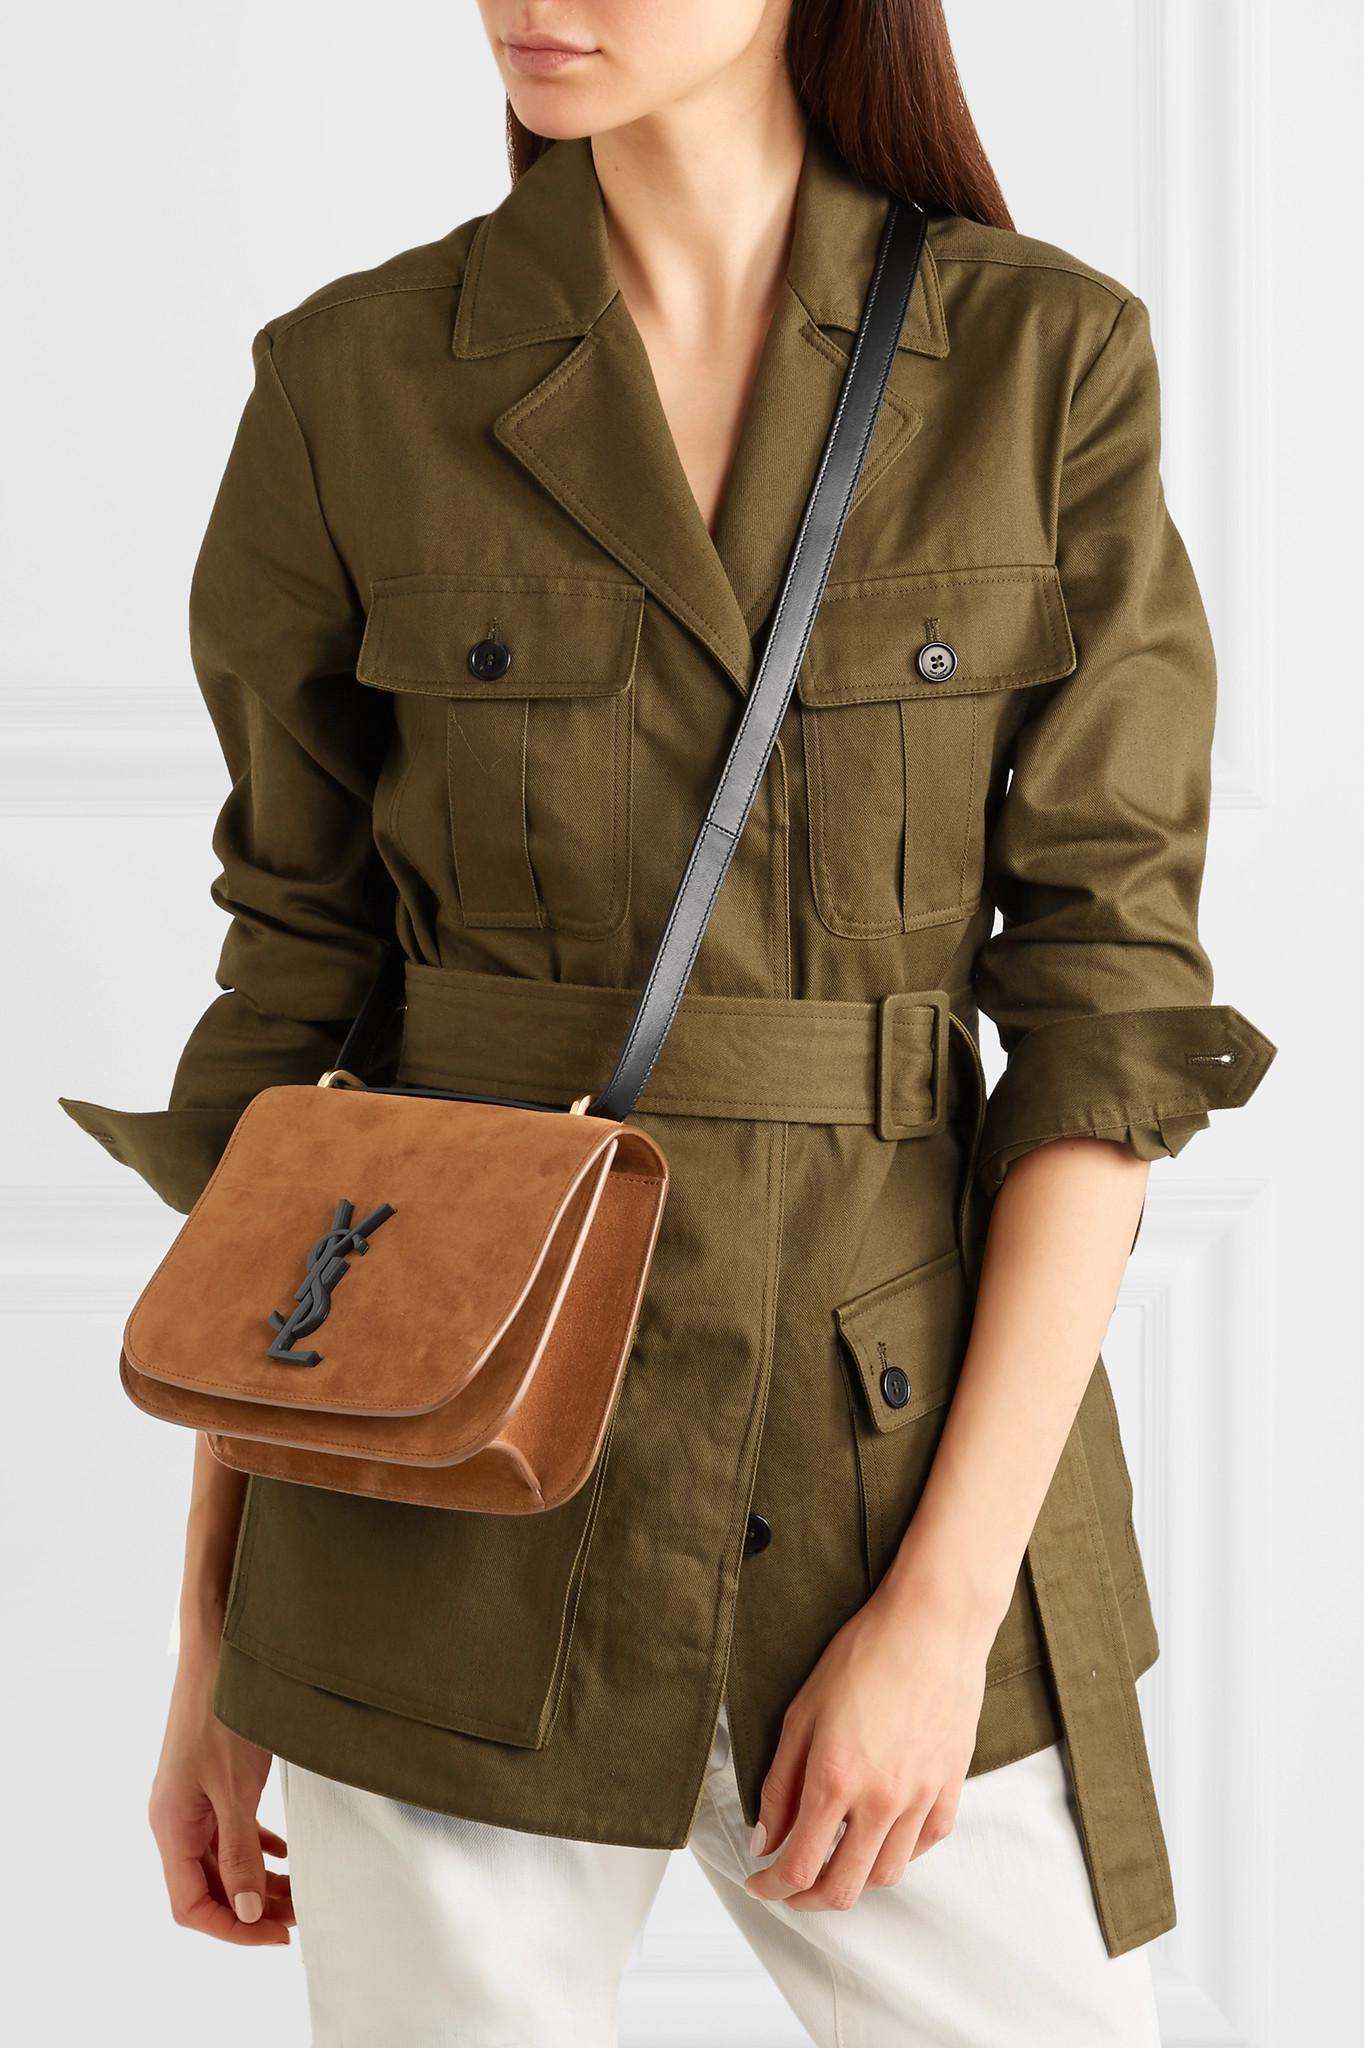 316b1be32d Lyst - Saint Laurent Spontini Leather-trimmed Suede Shoulder Bag